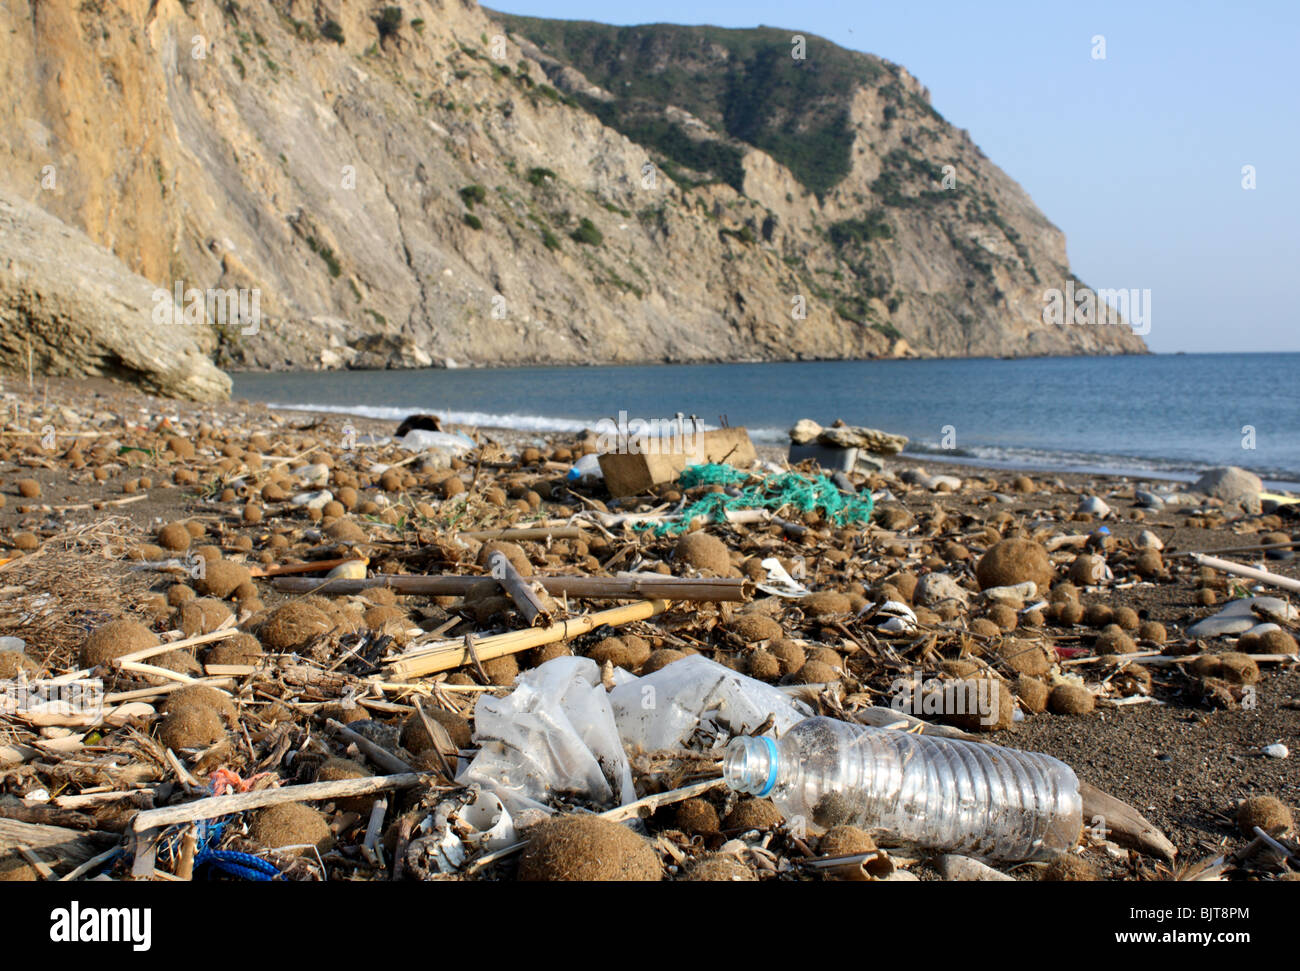 Dirty beach, Zante, 'National Marine Park Kalamaki' Greece, 2009 - Stock Image